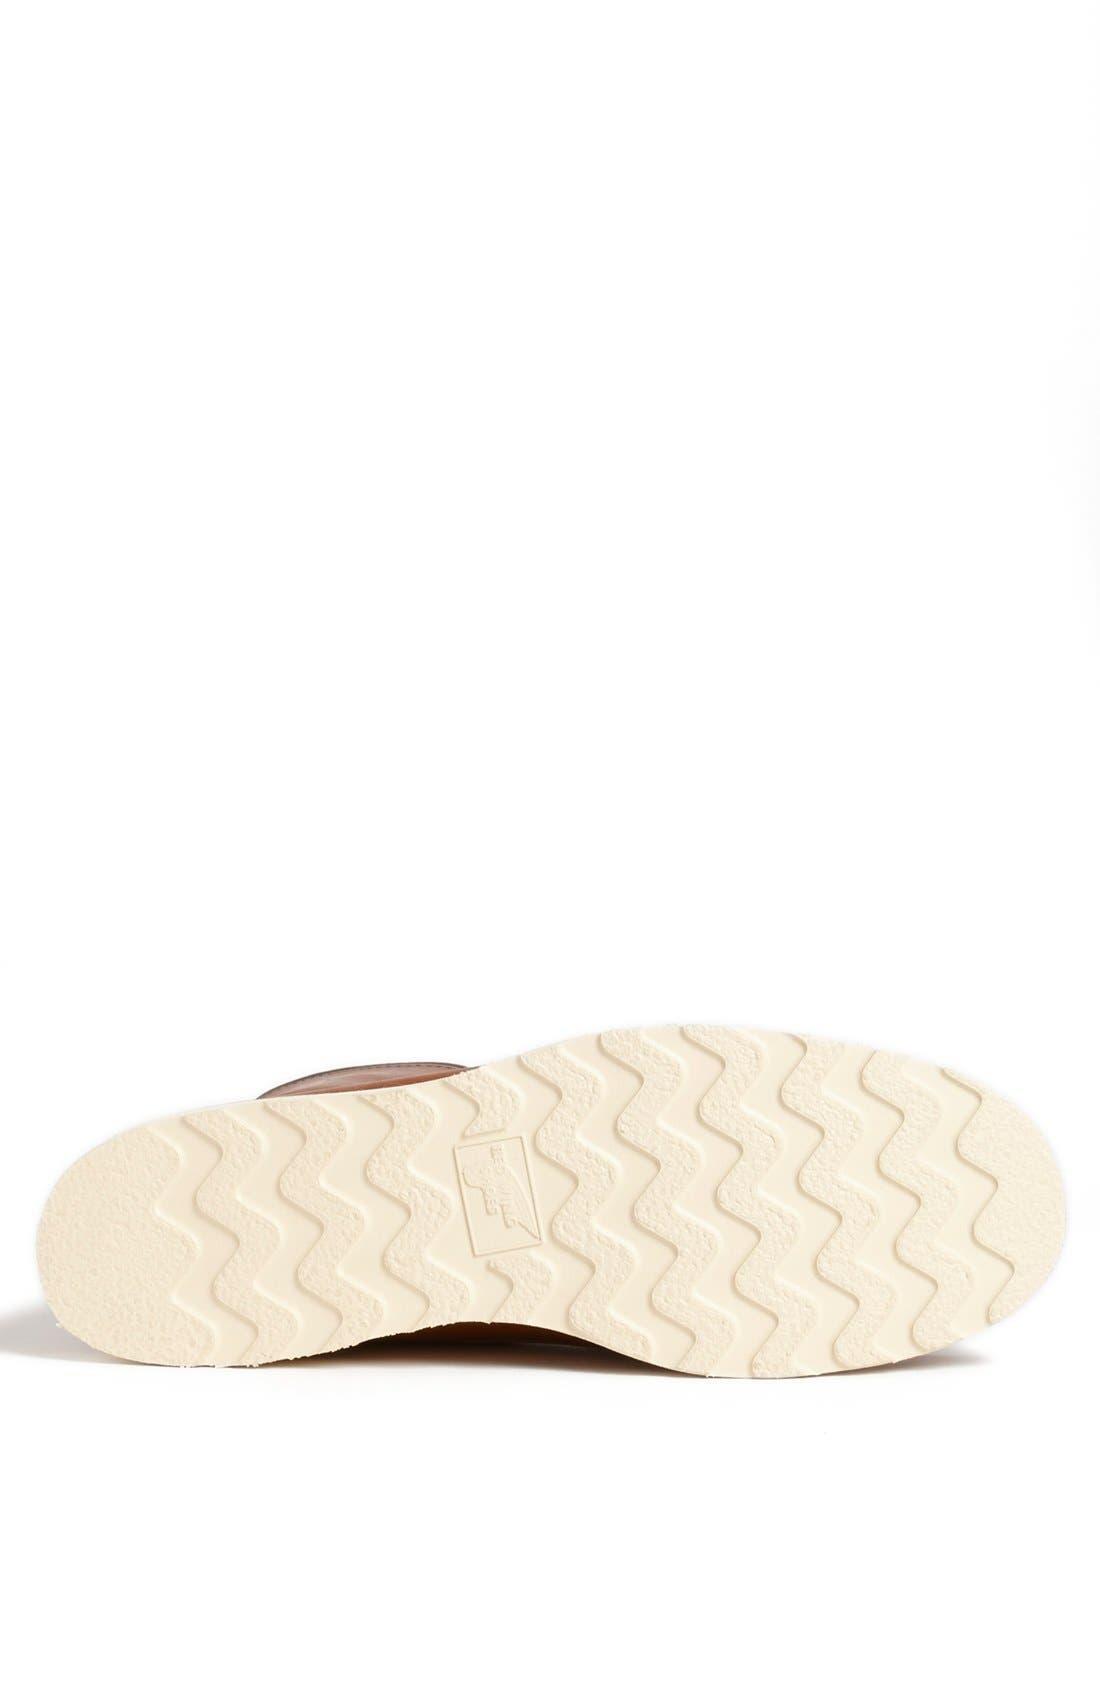 '877' Moc Toe Boot,                             Alternate thumbnail 5, color,                             COPPER LEATHER